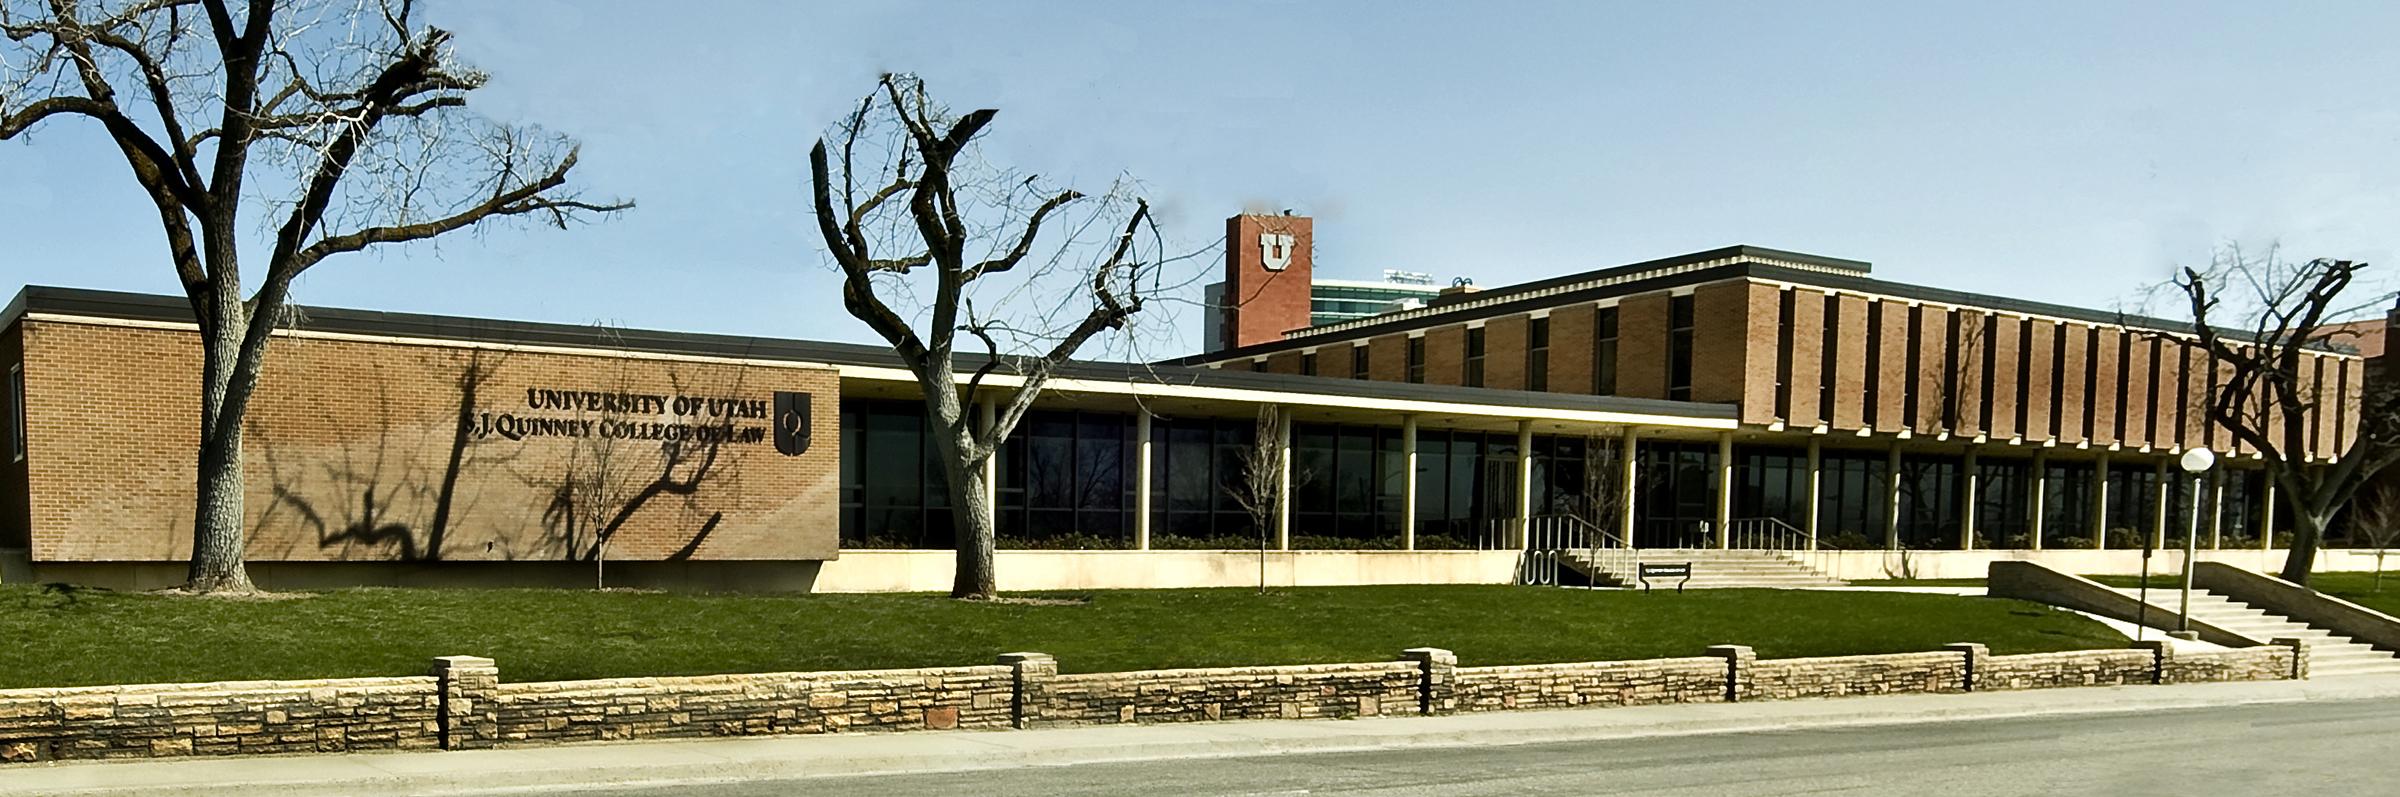 S.J. Quinney Law building.